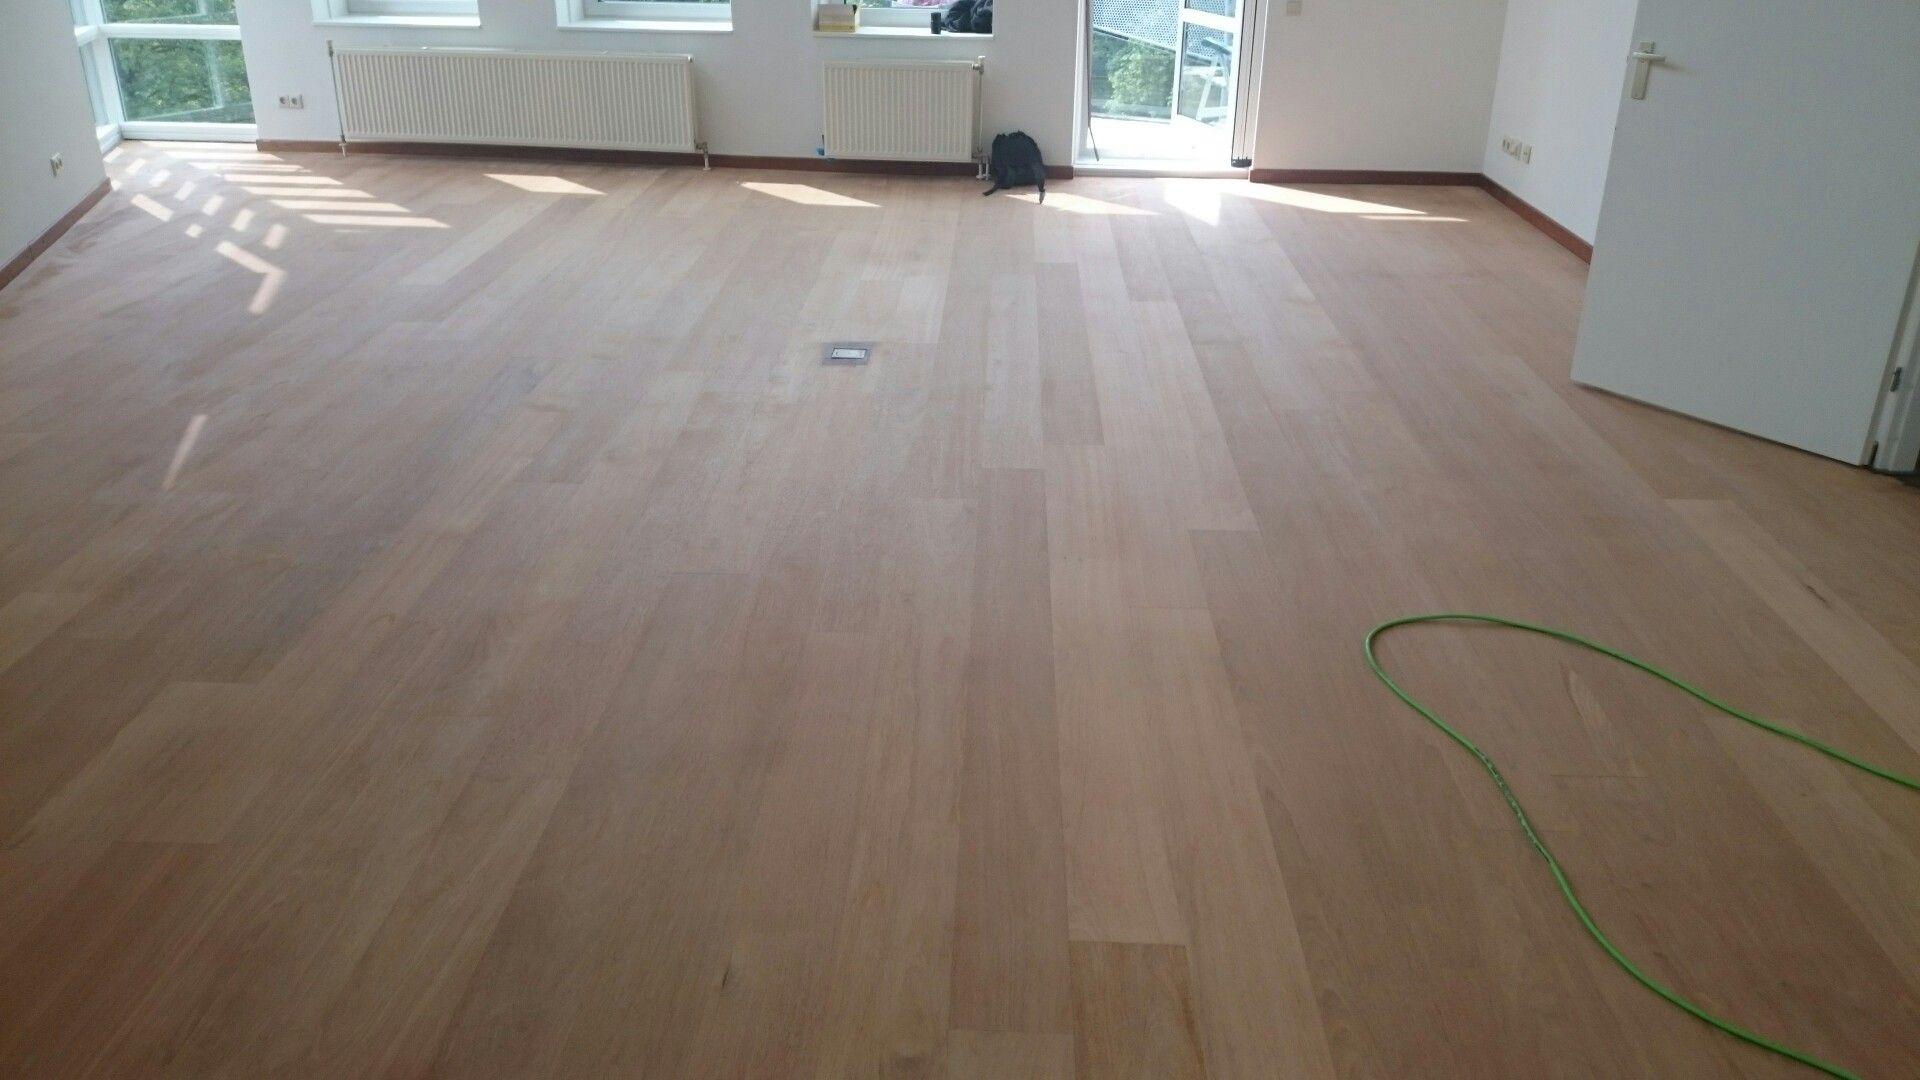 Houten vloer schuren #groningen houten vloer schuren pinterest